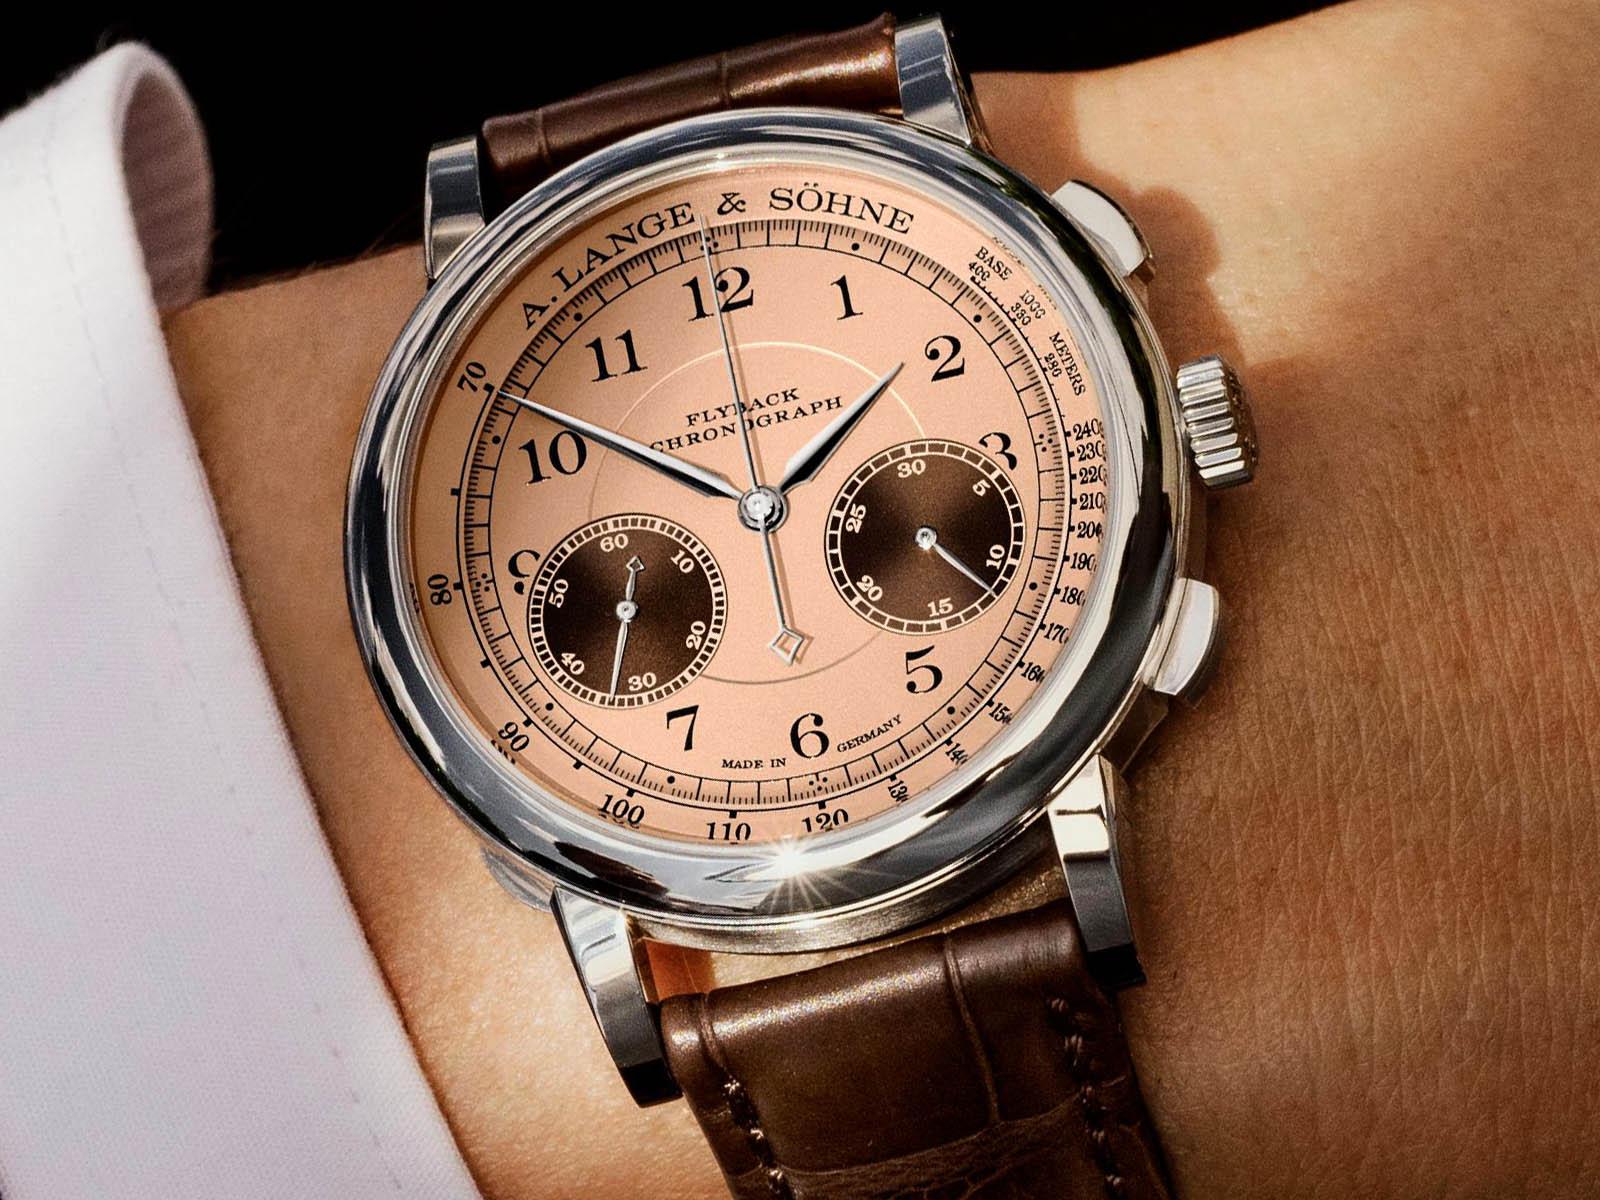 414-049-a-lange-sohne-1815-chronograph-2021-concorso-edition-6.jpg